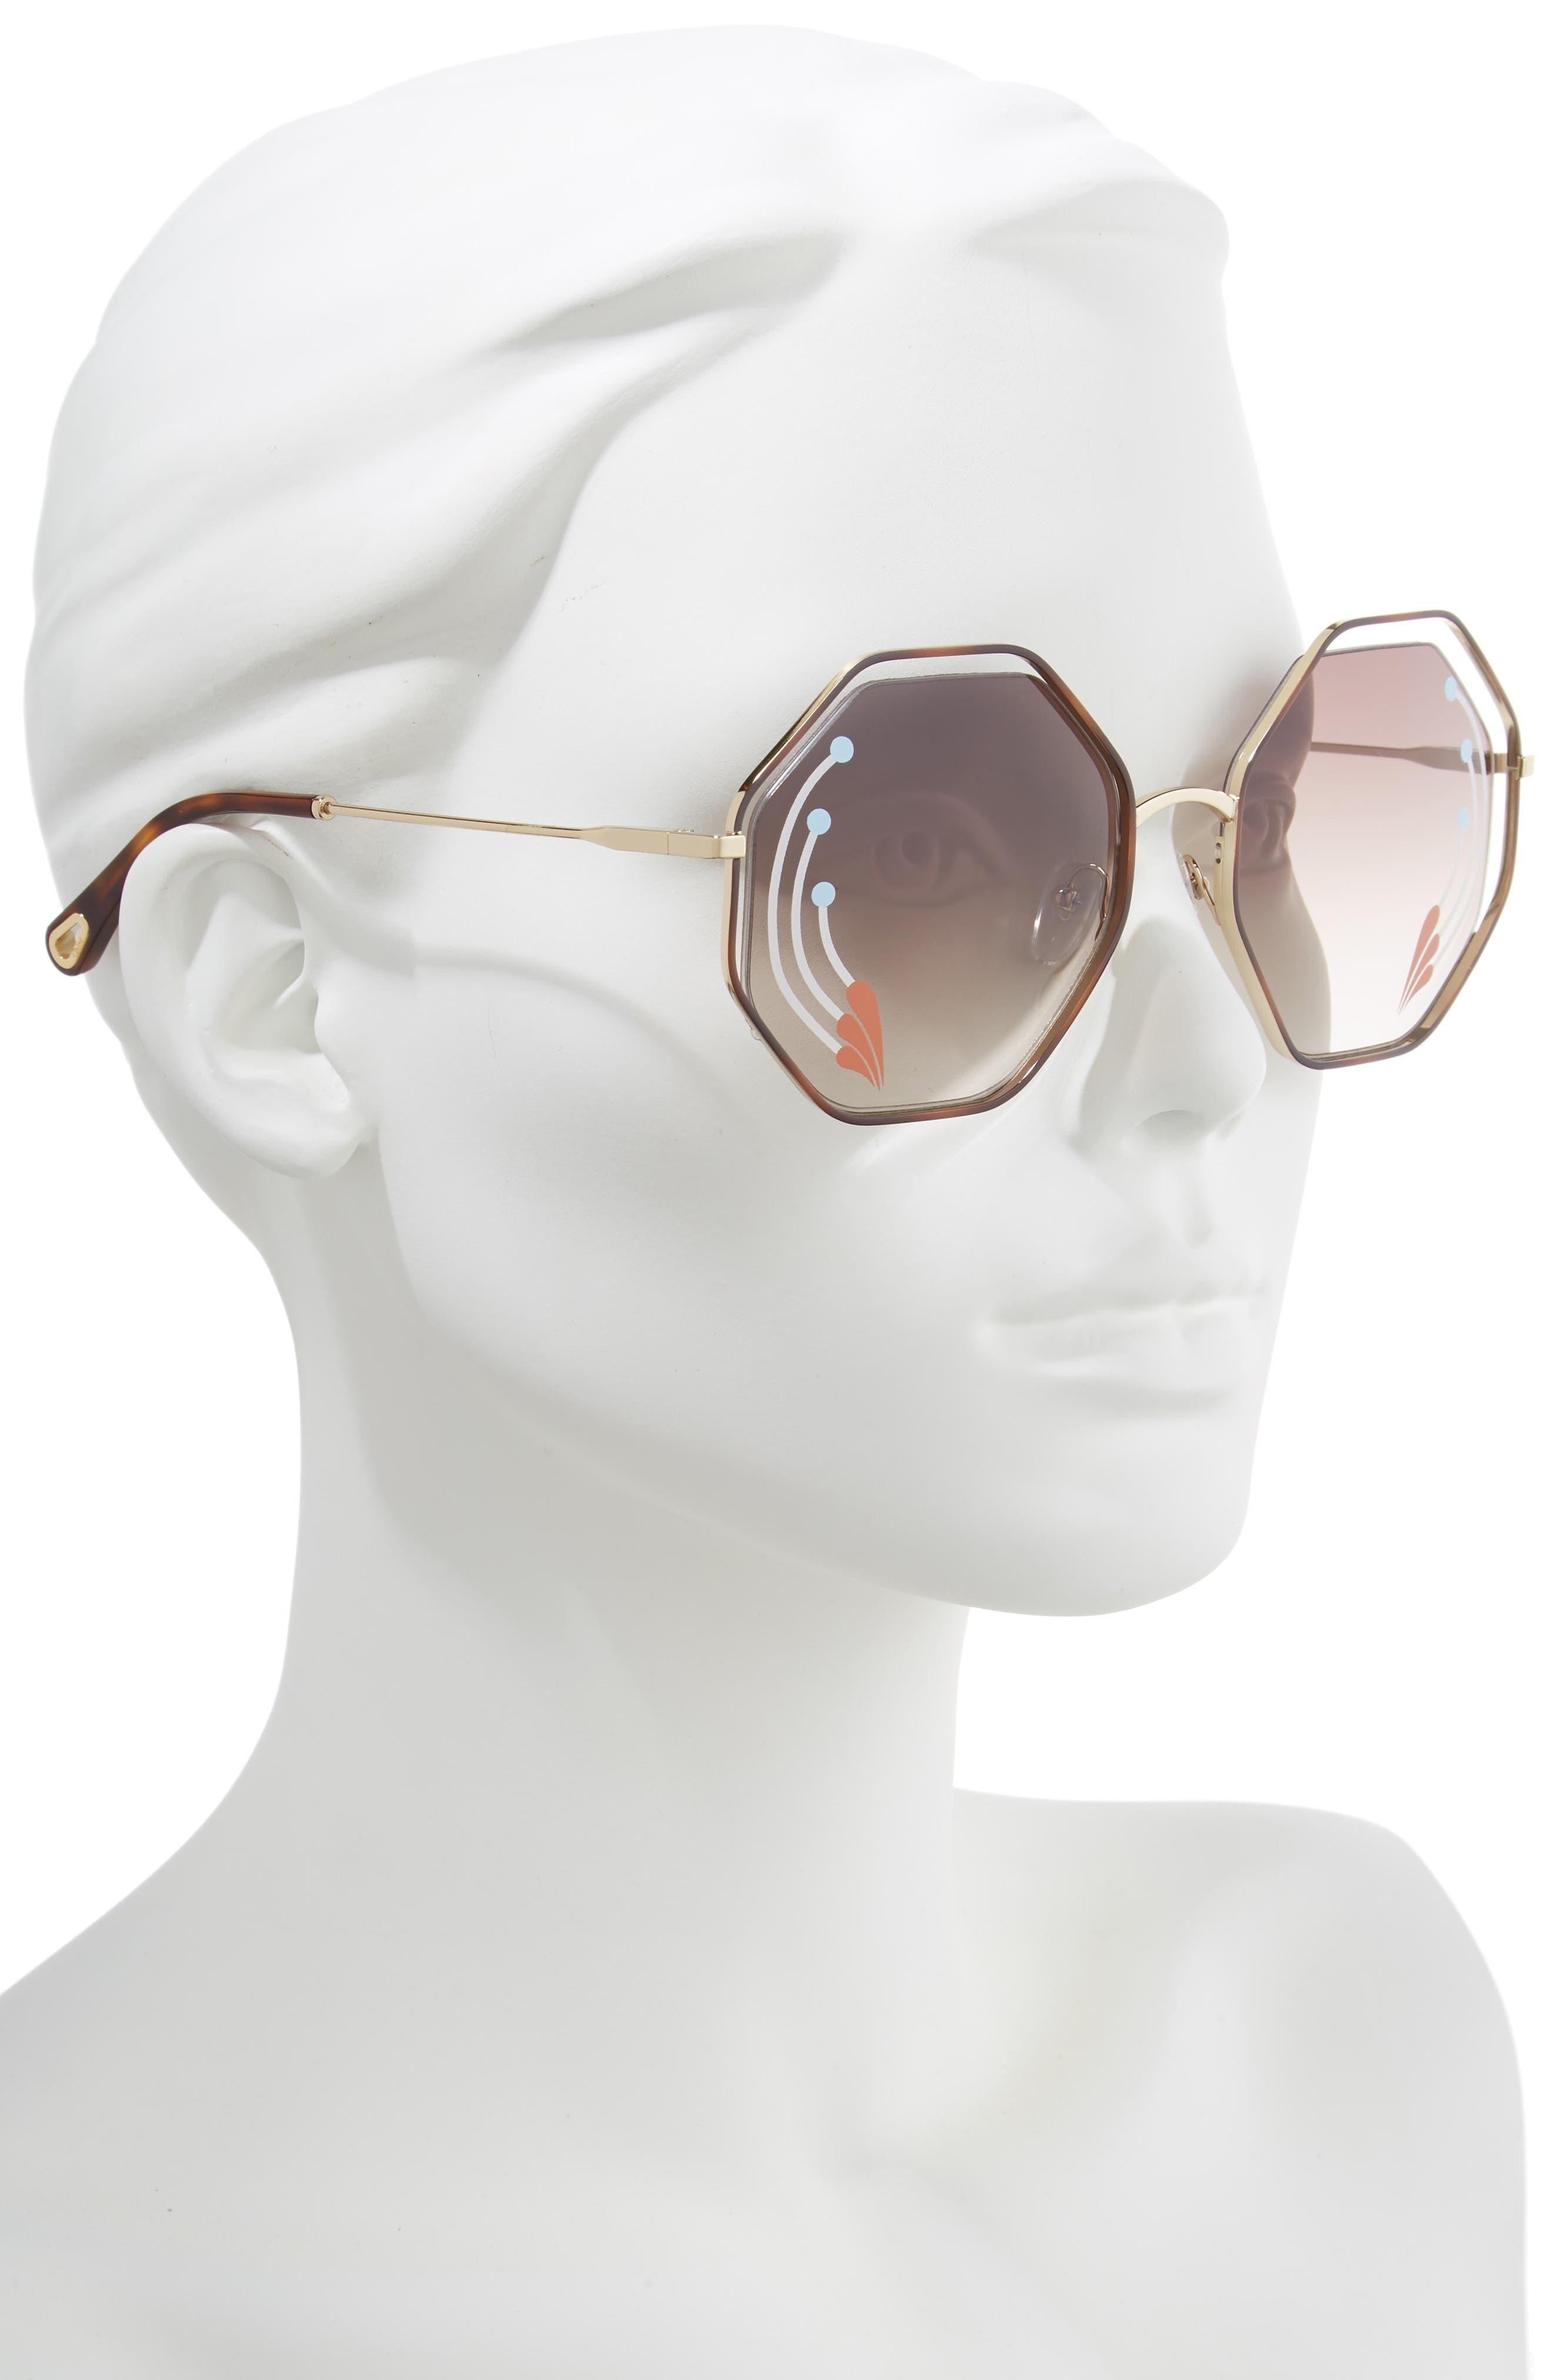 Poppy 58mm Octagonal Halo Lens Sunglasses,                             Alternate thumbnail 2, color,                             HAVANA/ GOLD BROWN W PRINT